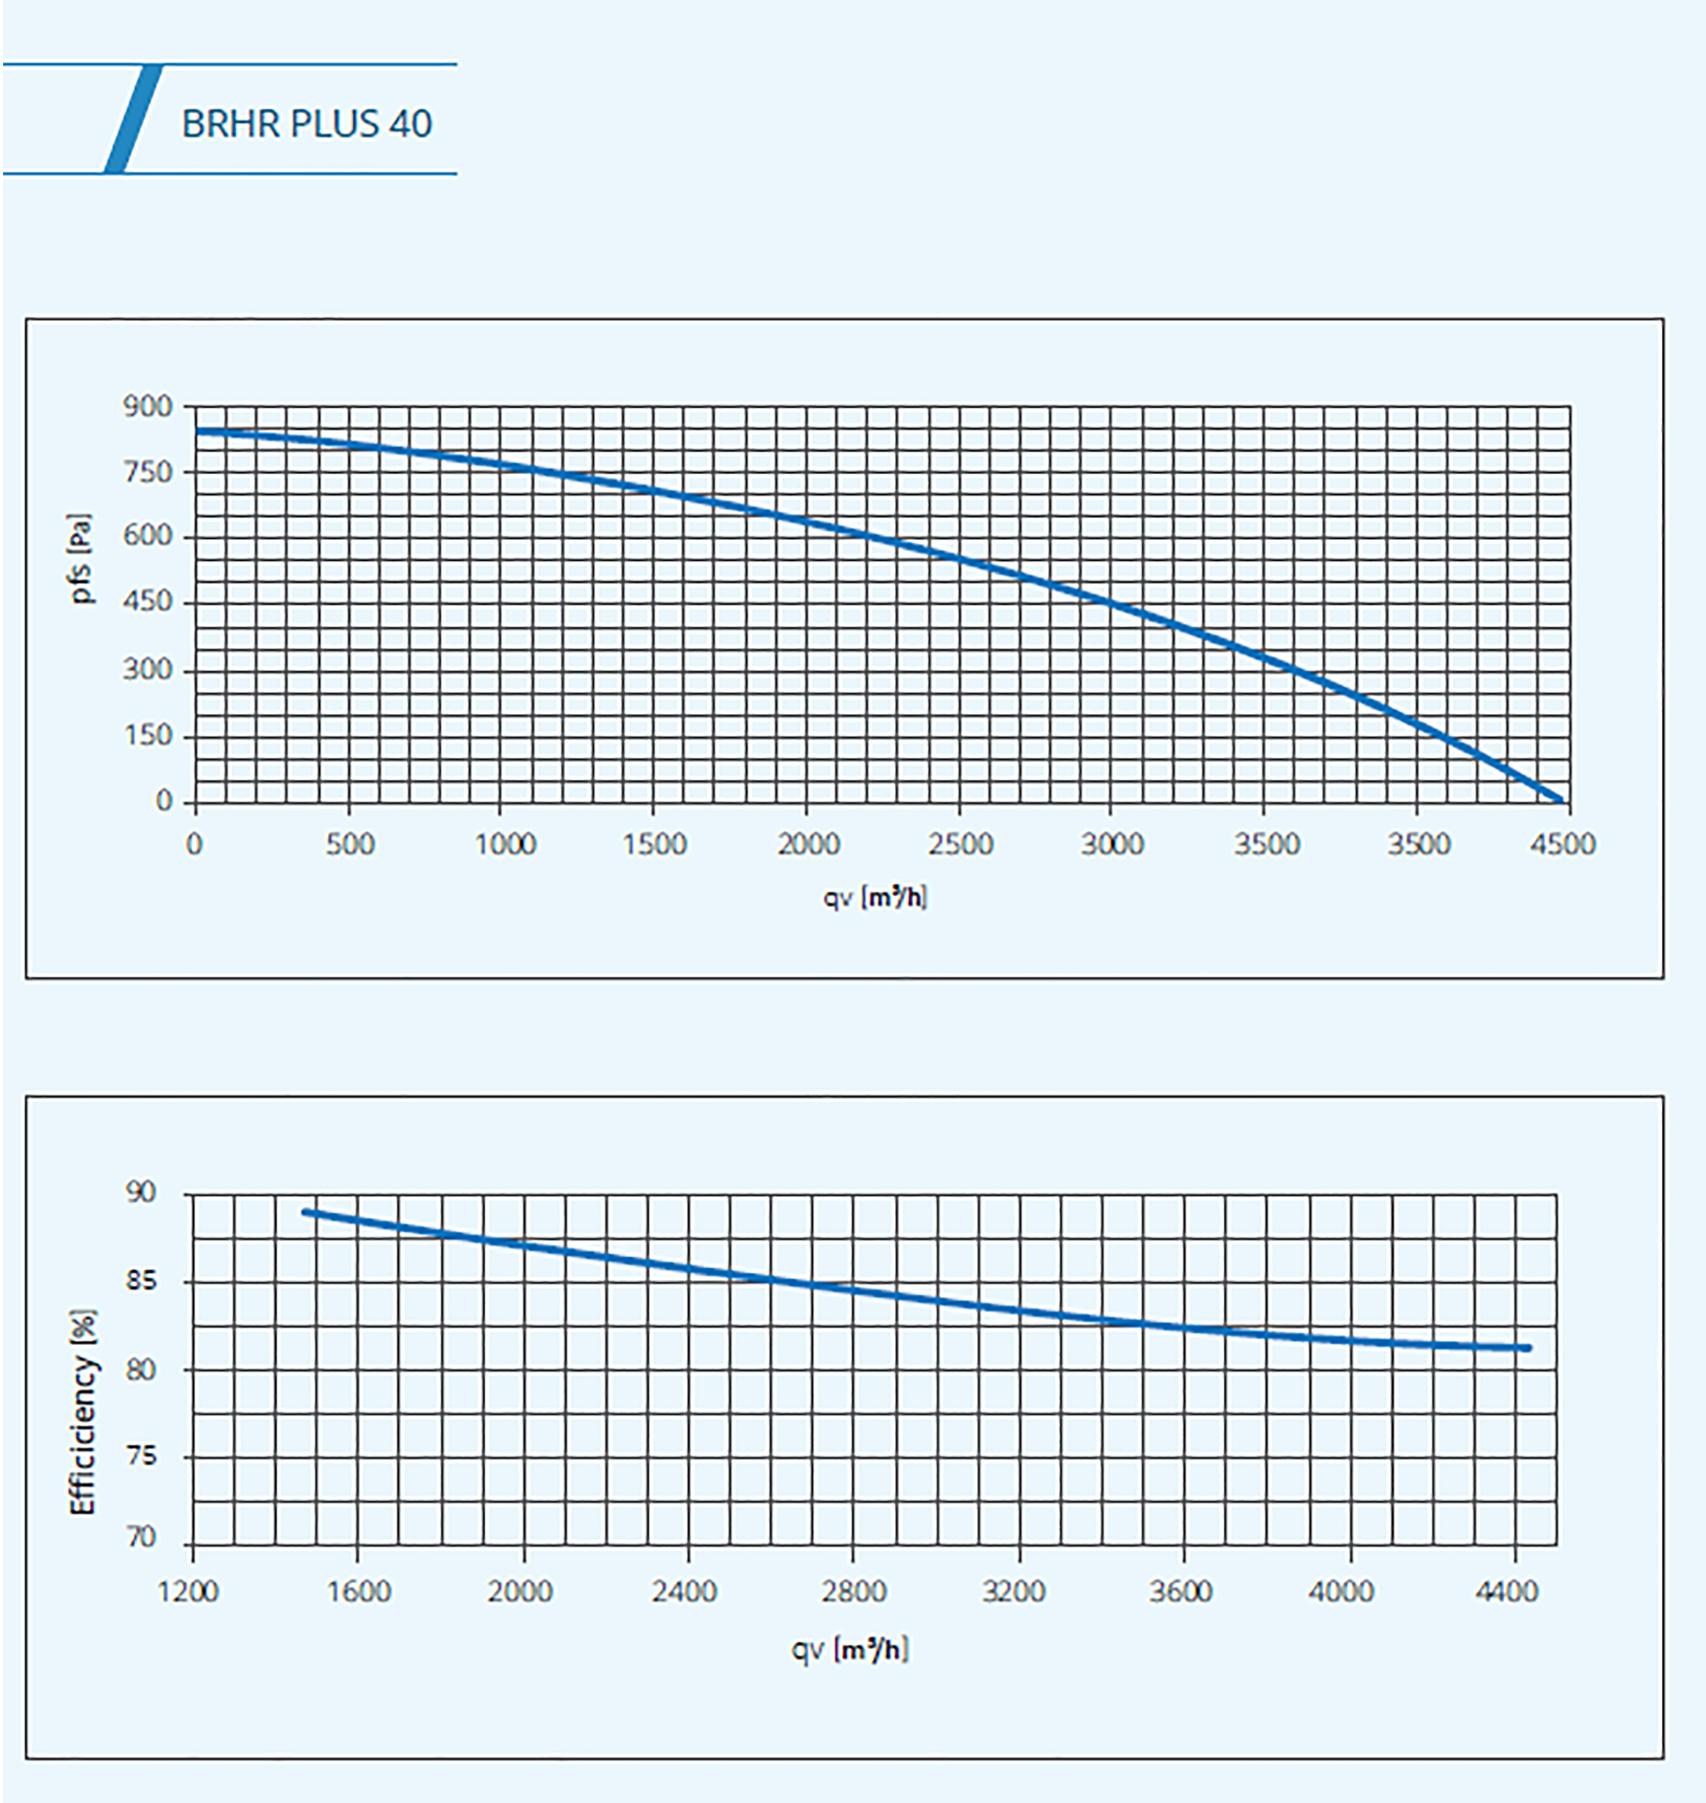 BSK plus 40 graph